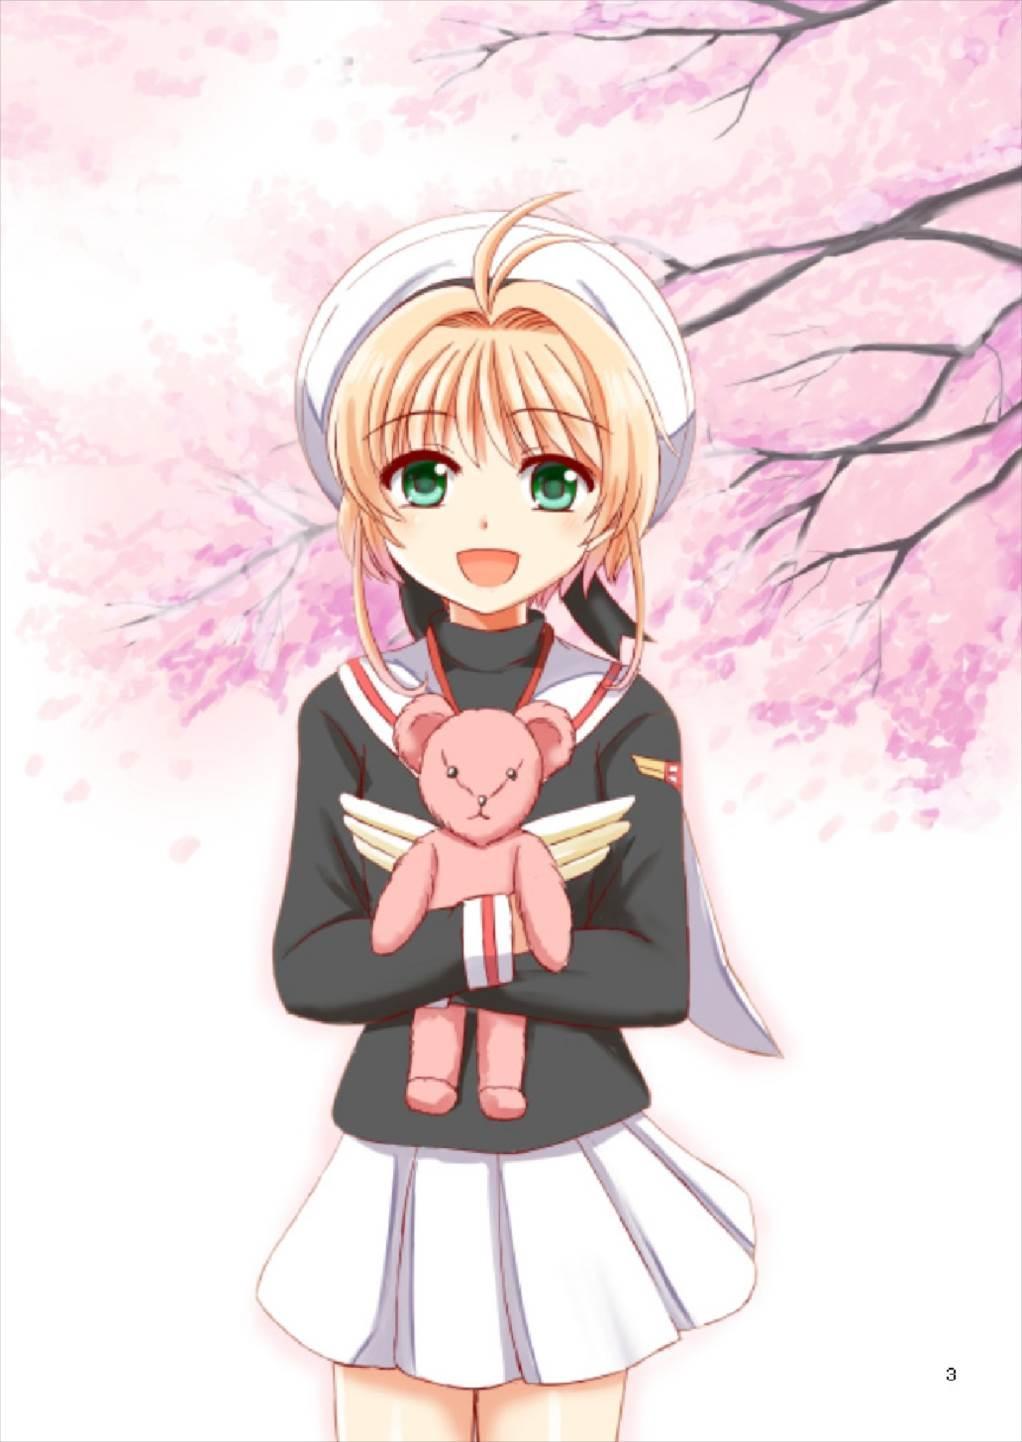 Sakura to Issho! 2